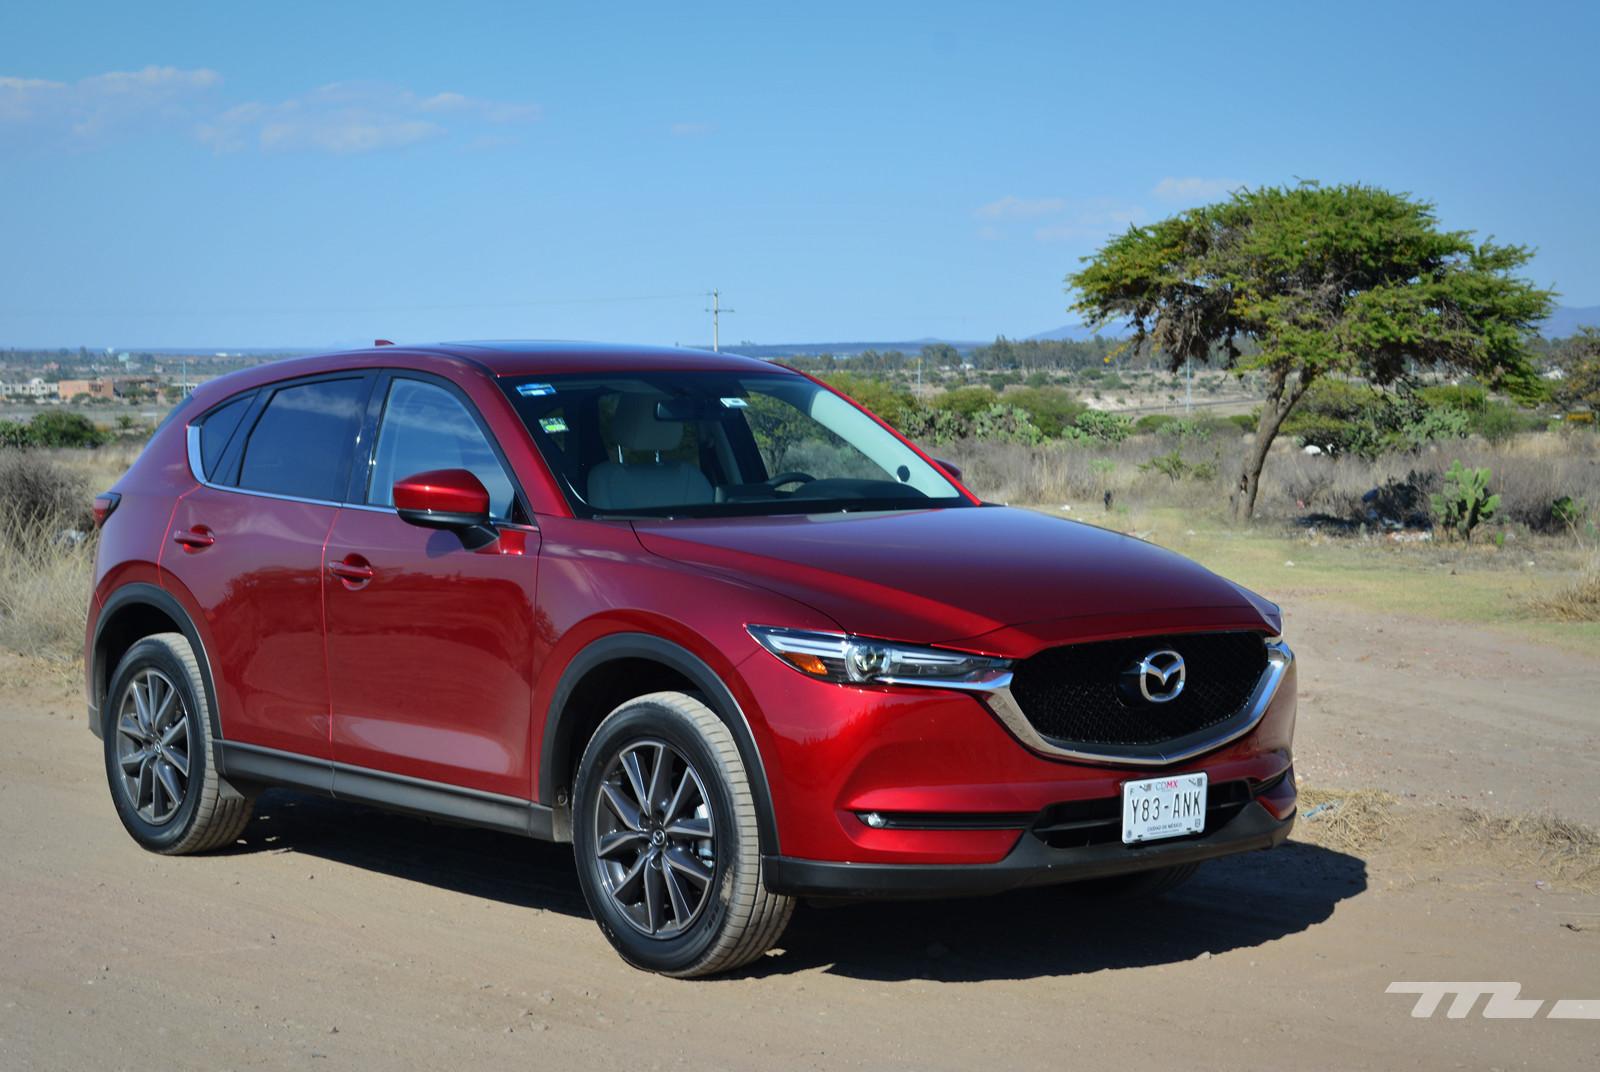 Foto de Mazda CX-5 2018 (Prueba) (7/21)